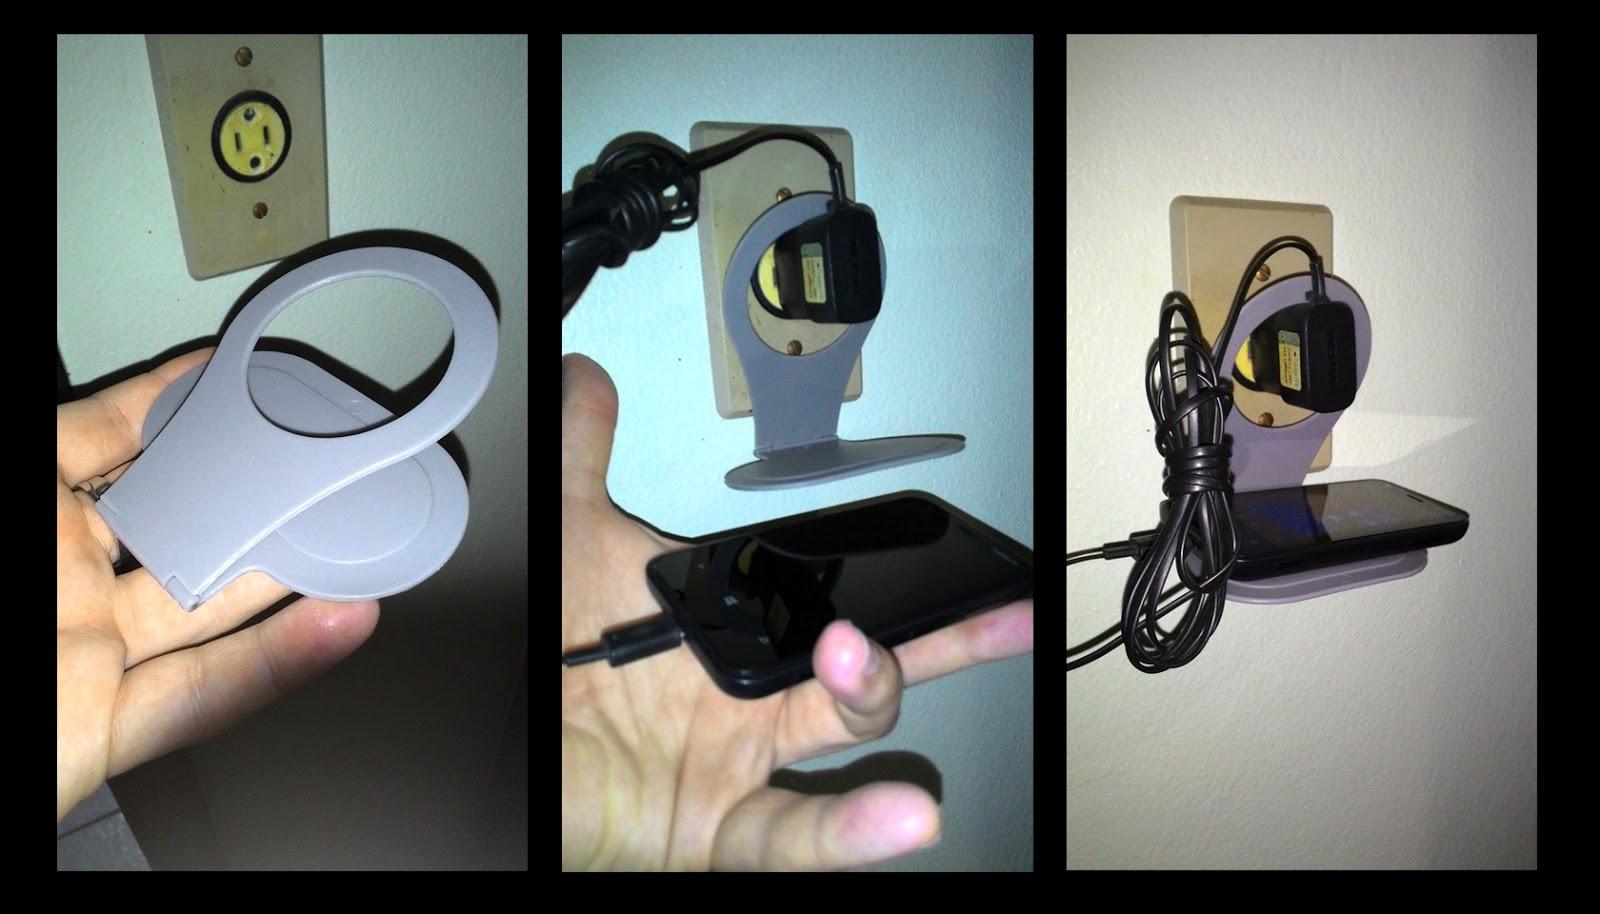 suporte tomada recarregar celular